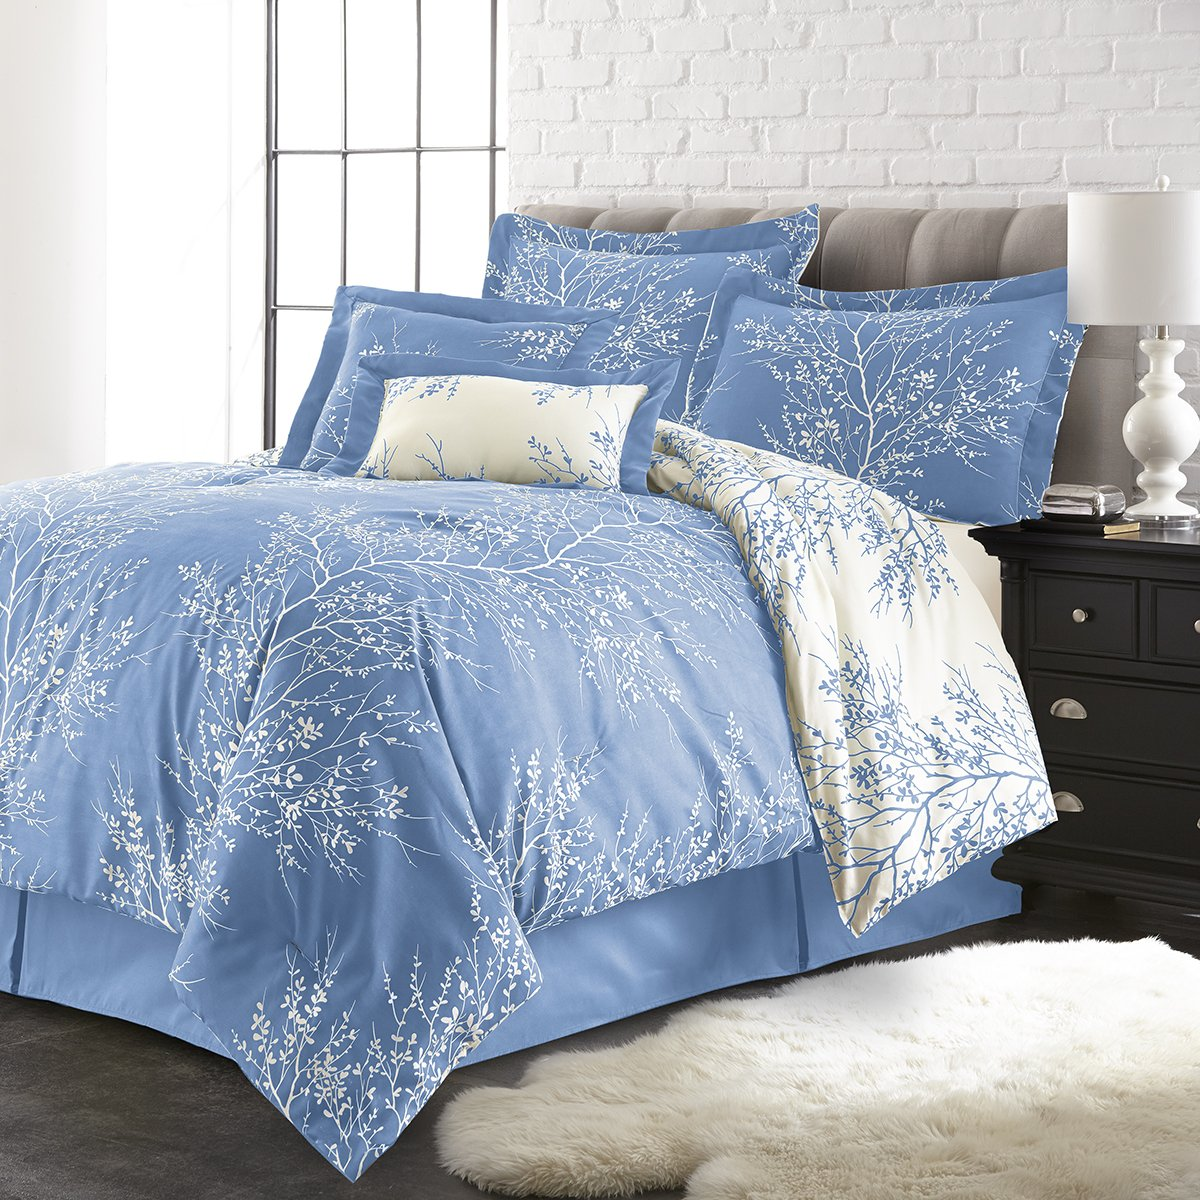 Spirit Linen Hotel 5Th Ave Plush Reversible Foliage Comforter, King, Light Blue/White